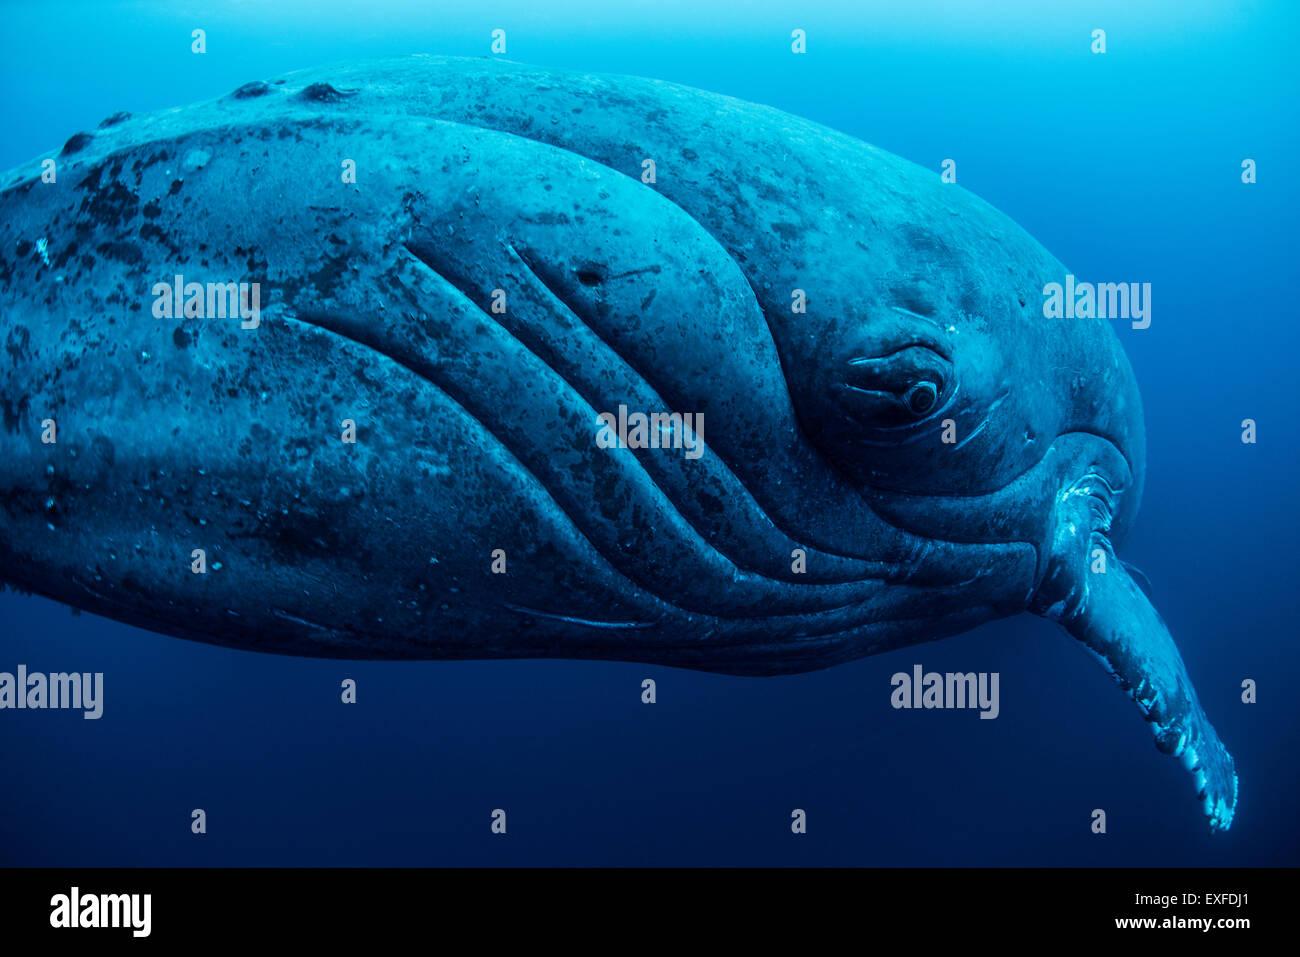 Curioso, ballena jorobada hembra closeup, Roca Partida, Revillagigedo, México Imagen De Stock